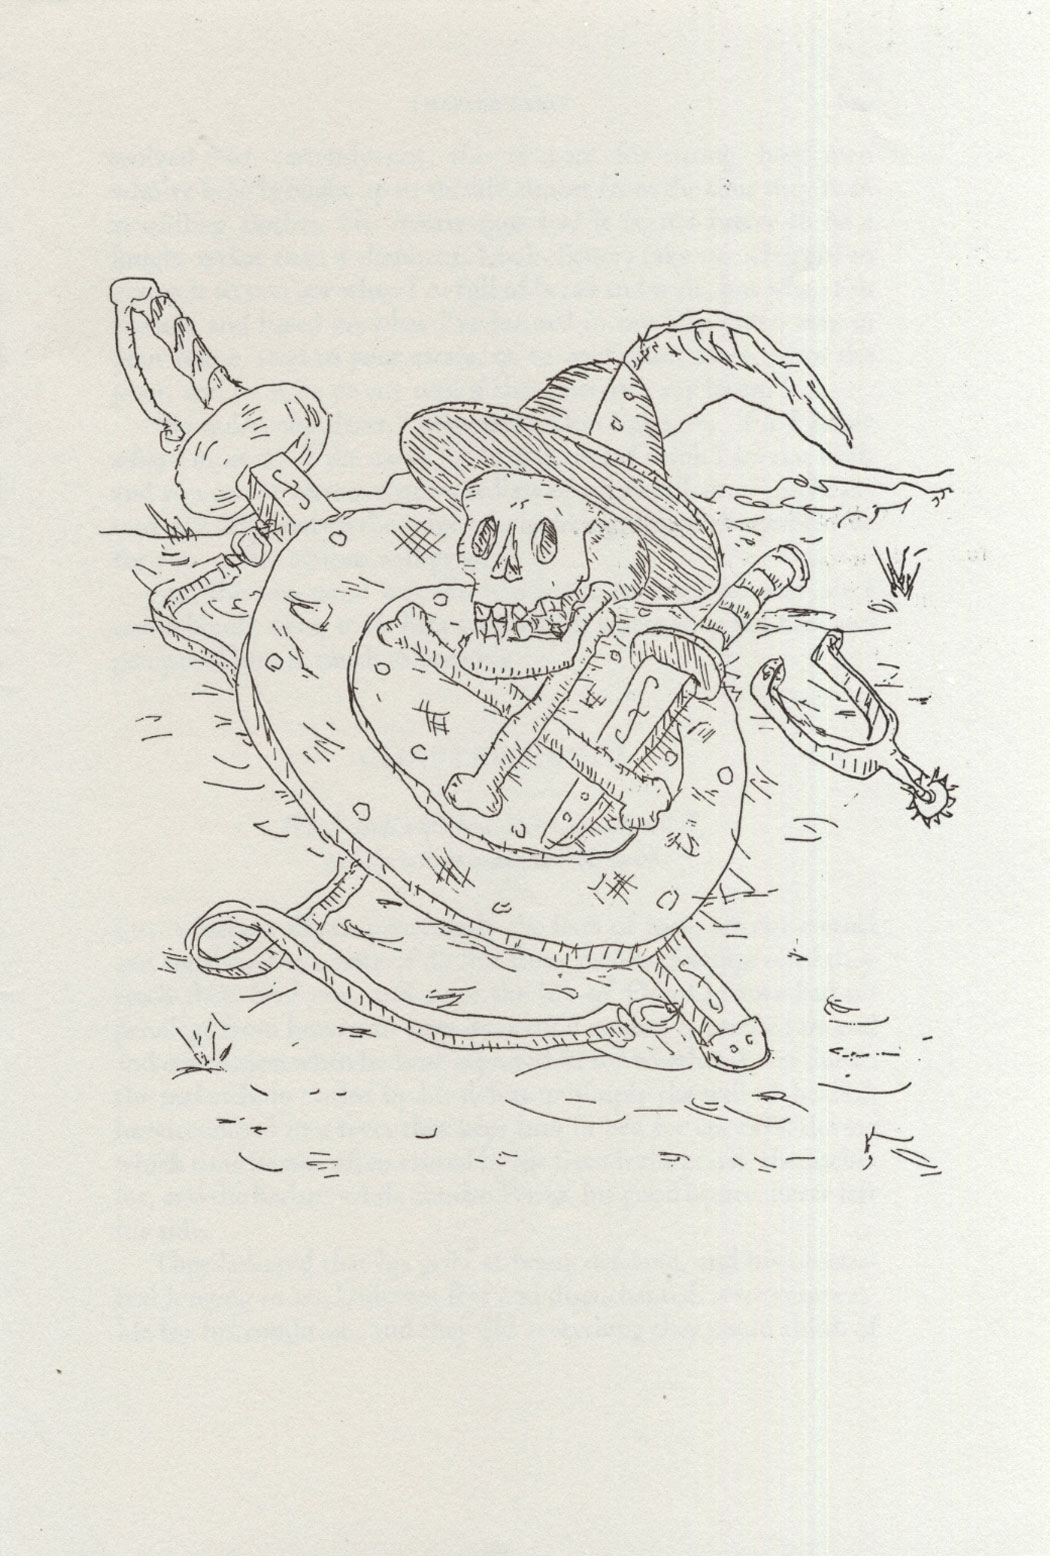 p.629.ill.memento-mori.jpg